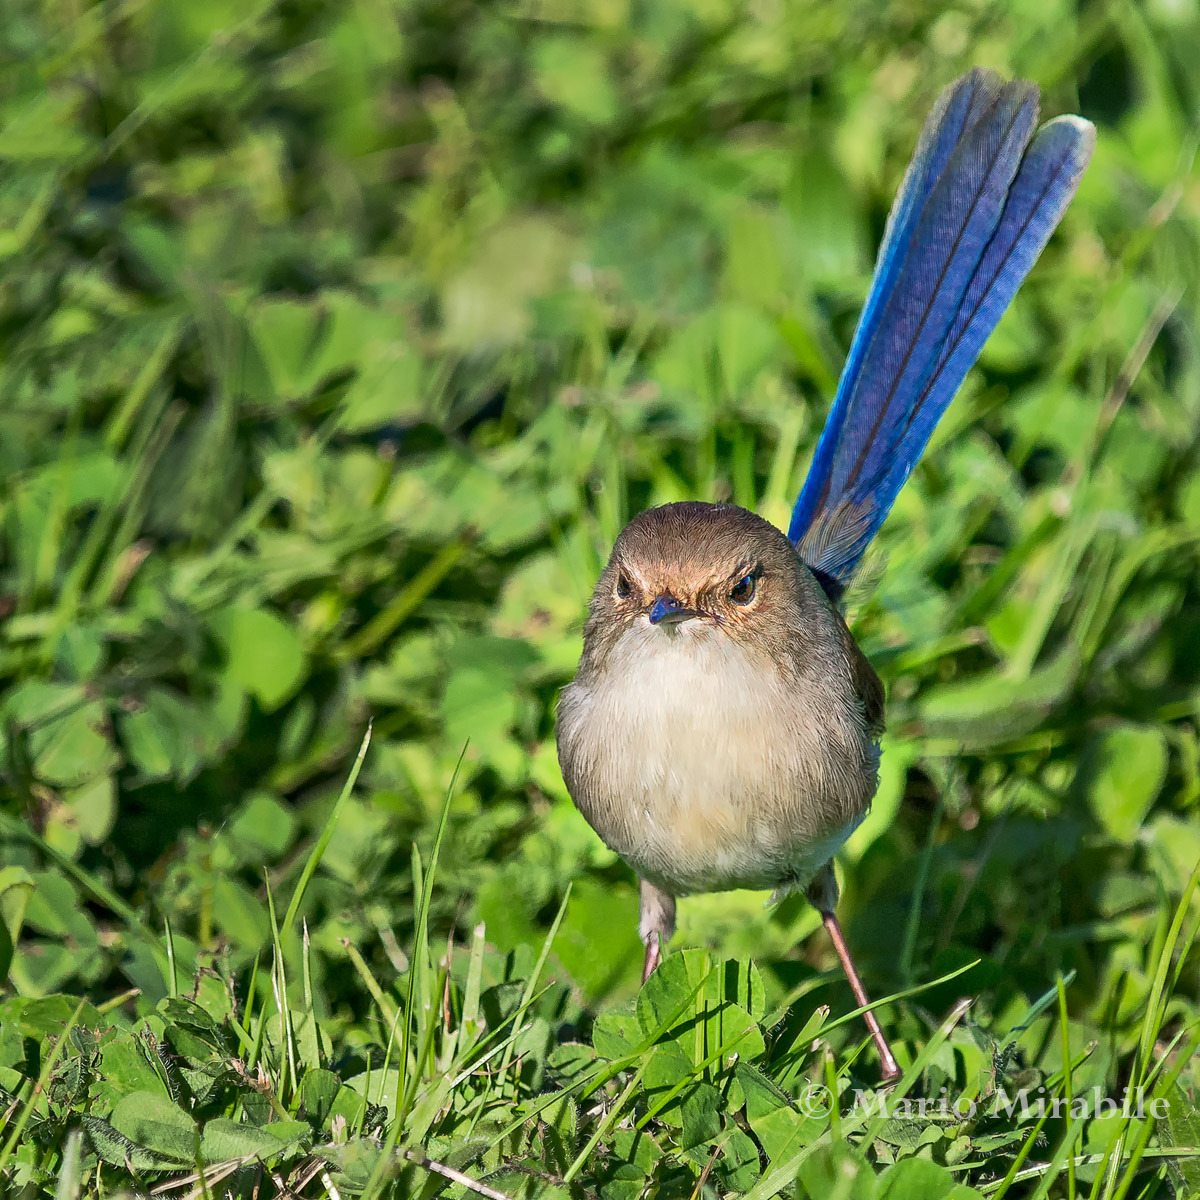 20140803 kARKAROOK BIRDS (5) copy.jpg